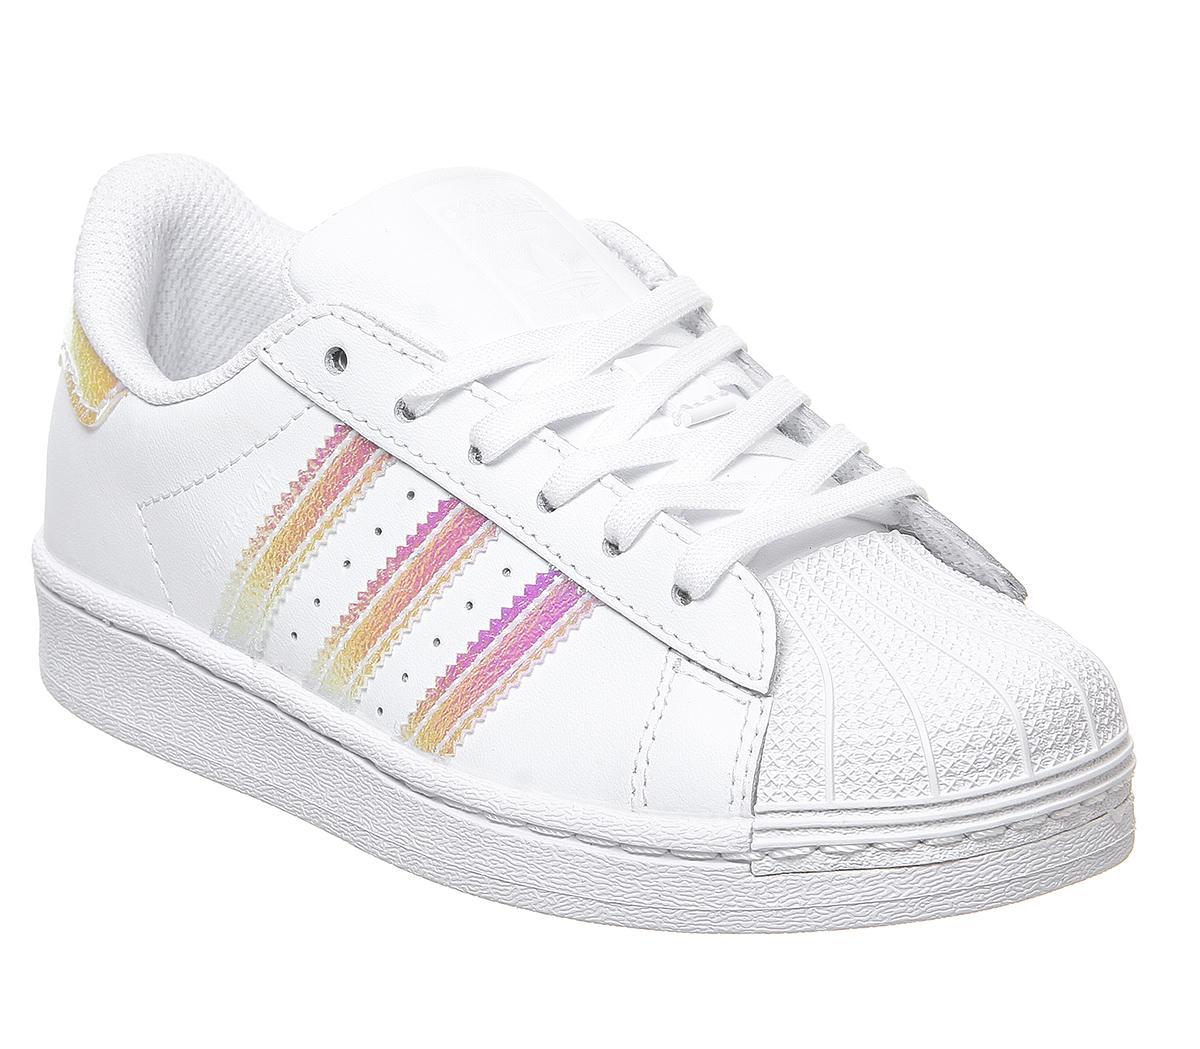 adidas Superstar Kids Trainers White Iridescent - Unisex